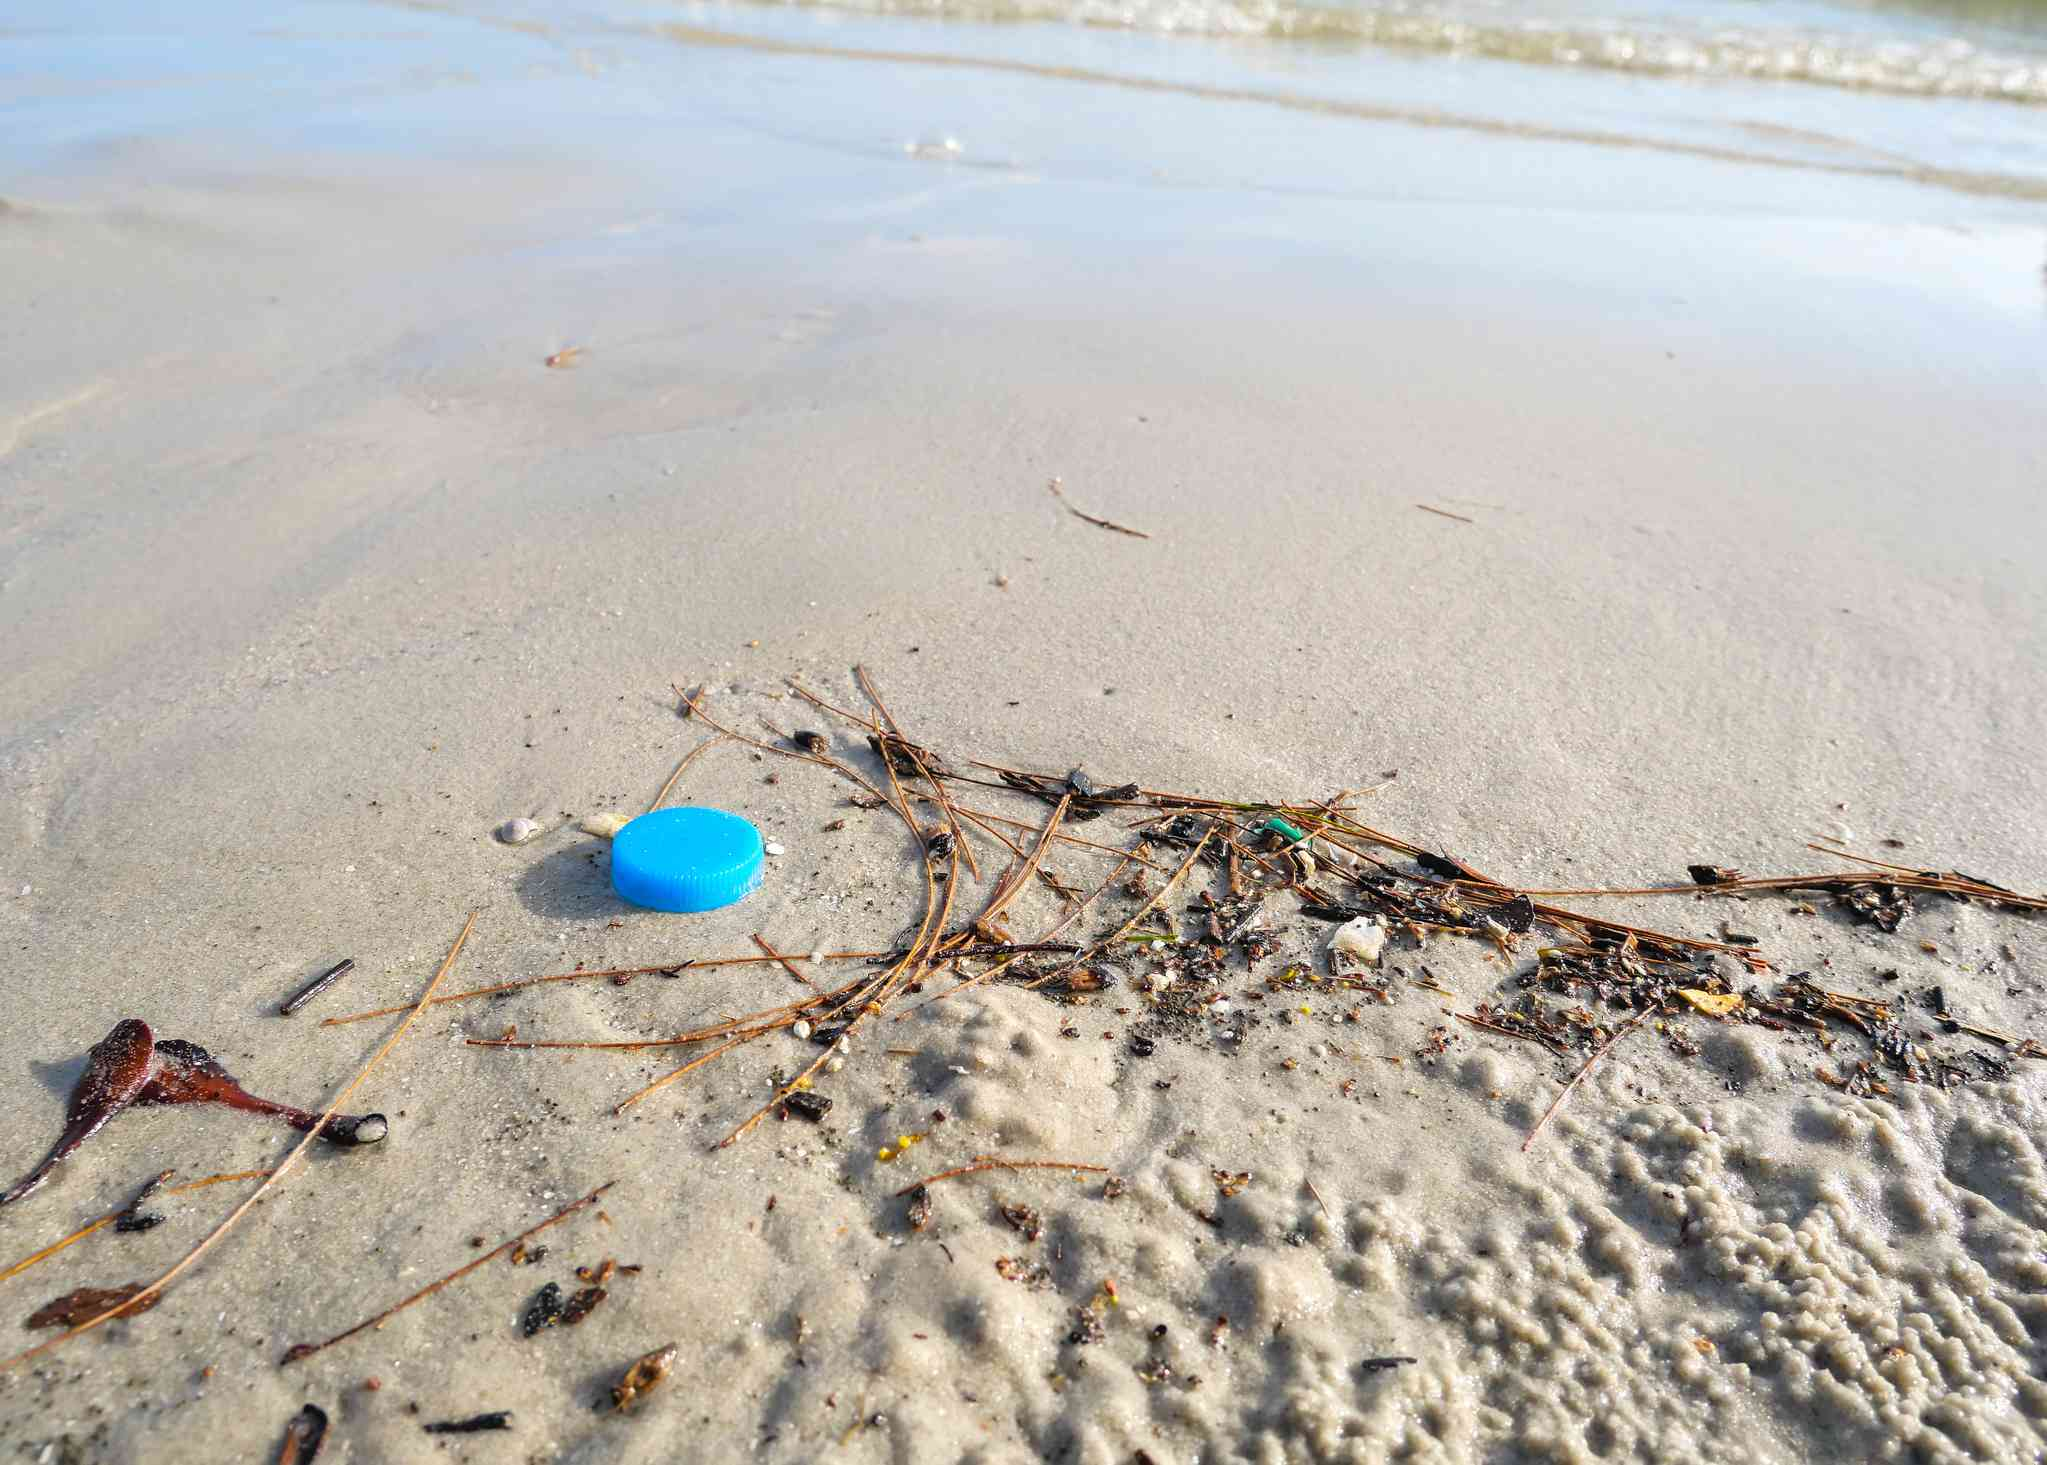 Plastic bottle cap debris on the beach